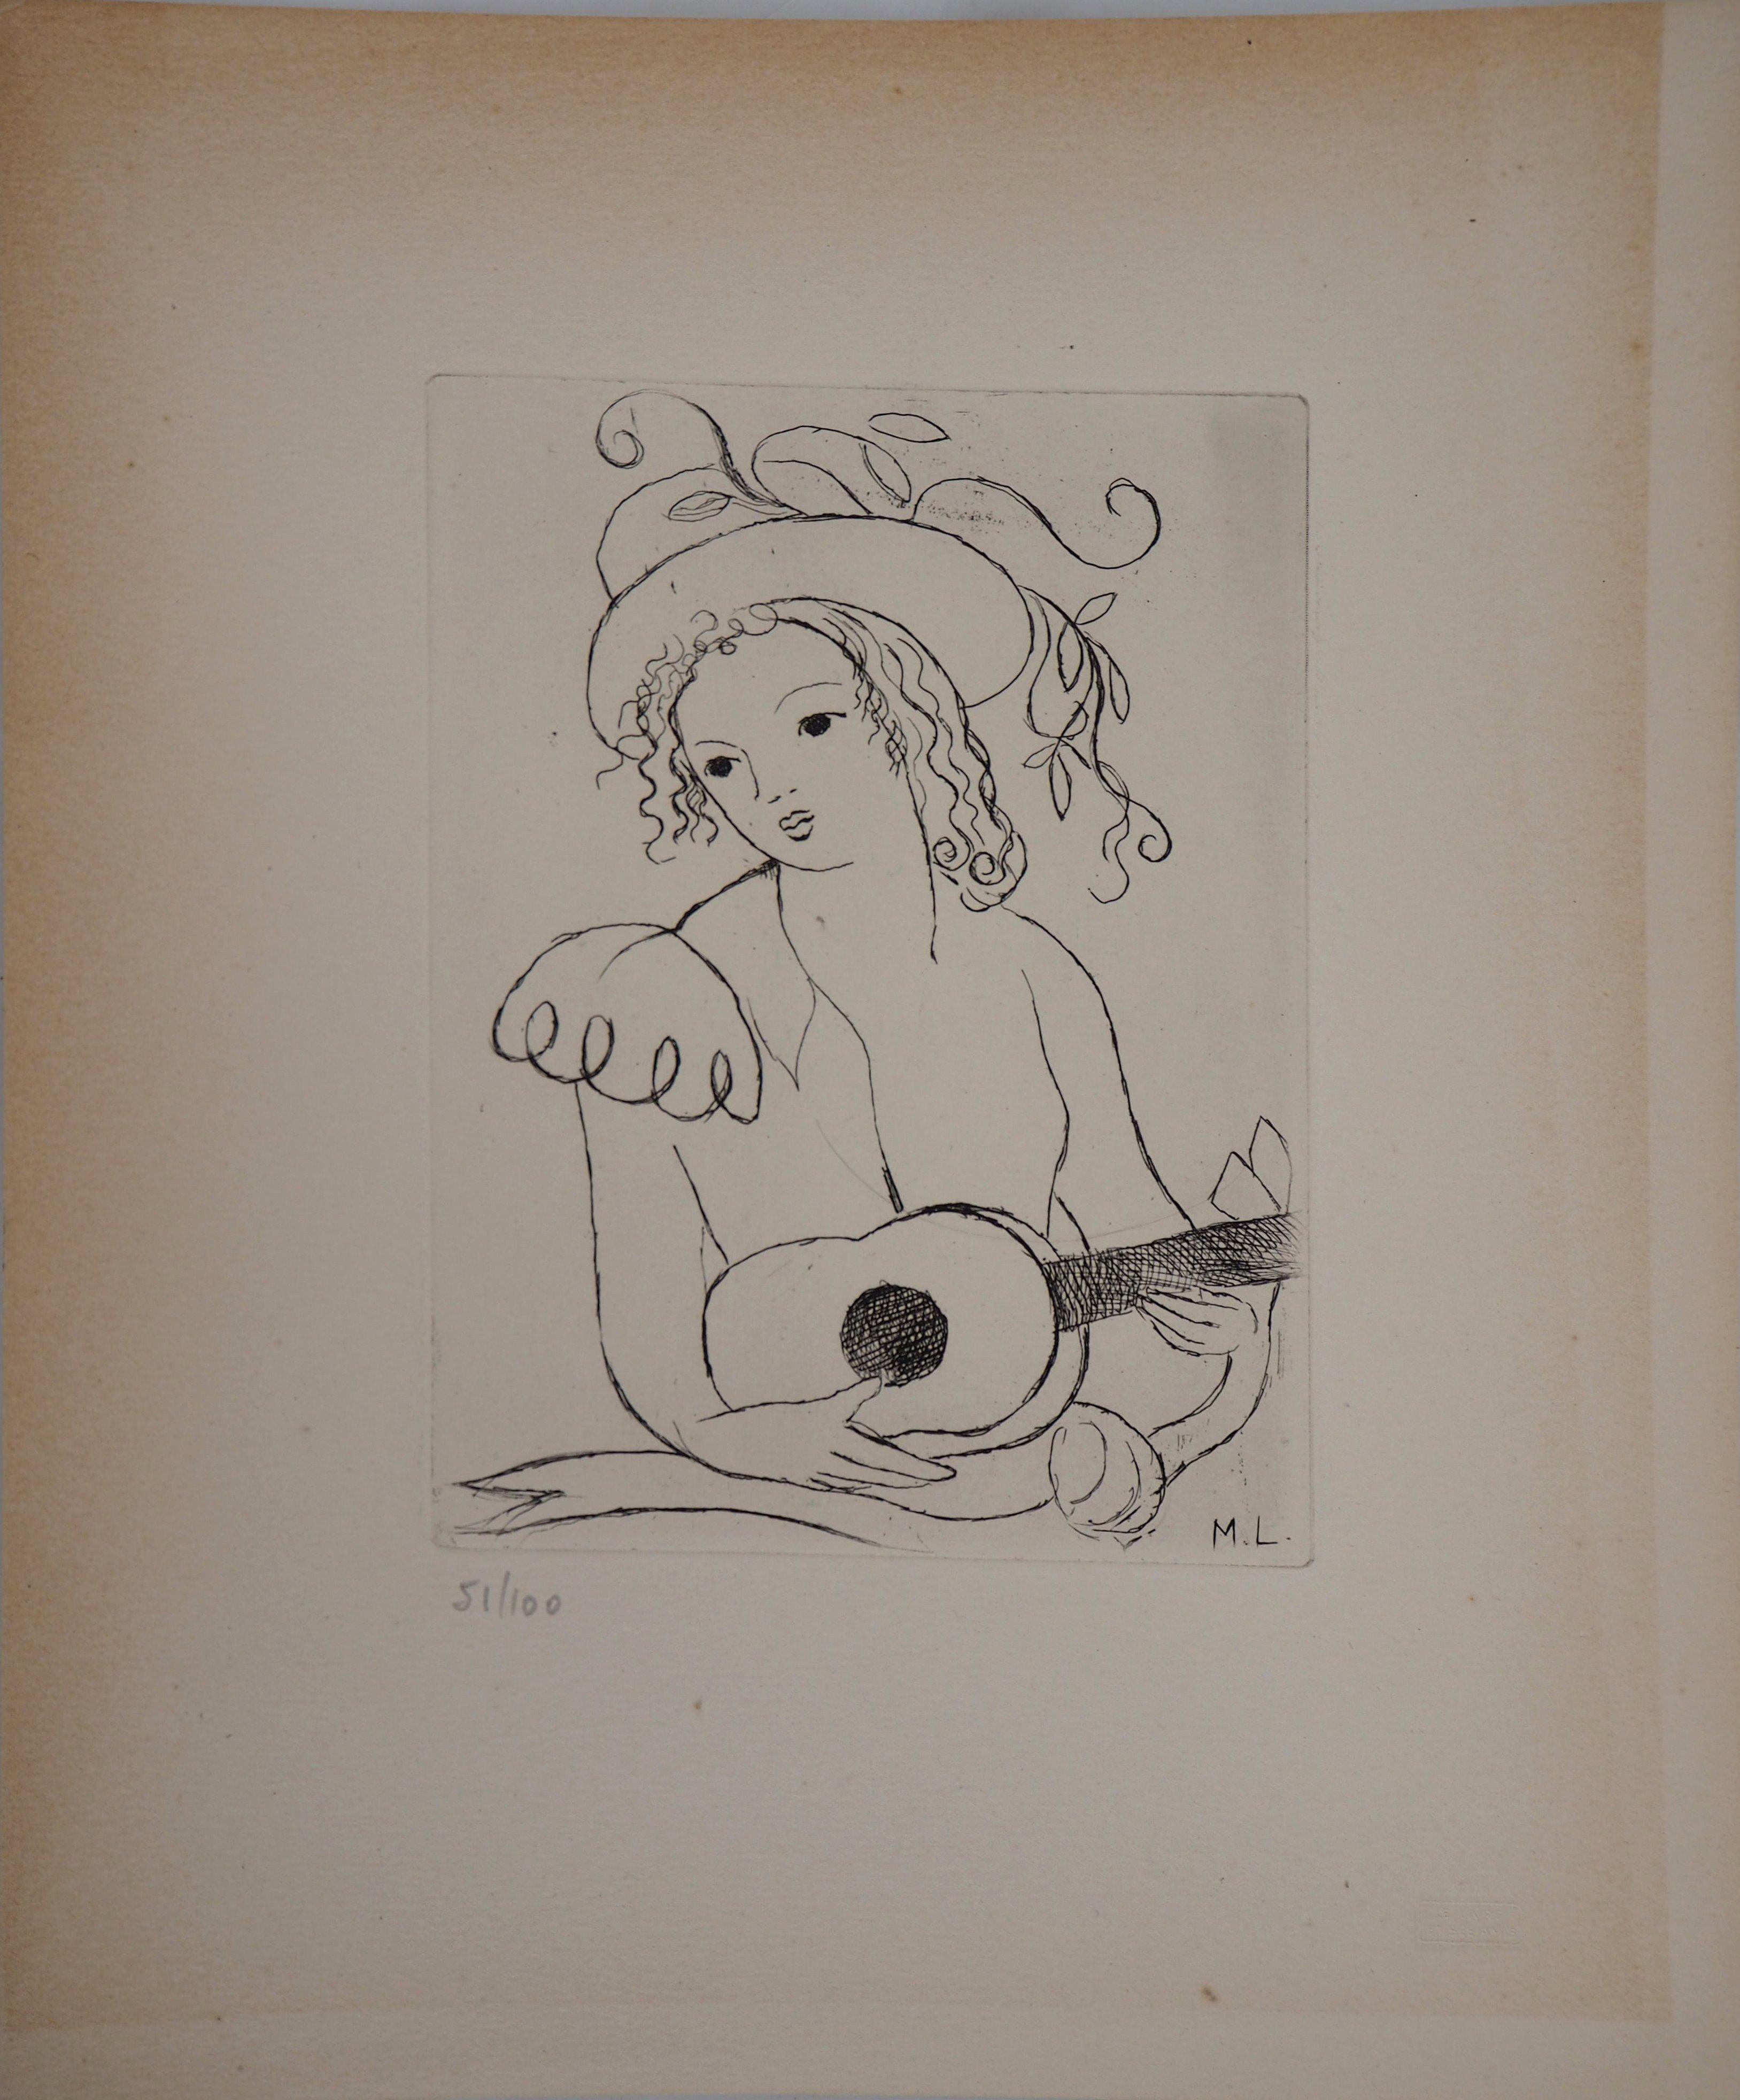 Young Girl with Guitar - Original etching, 1945